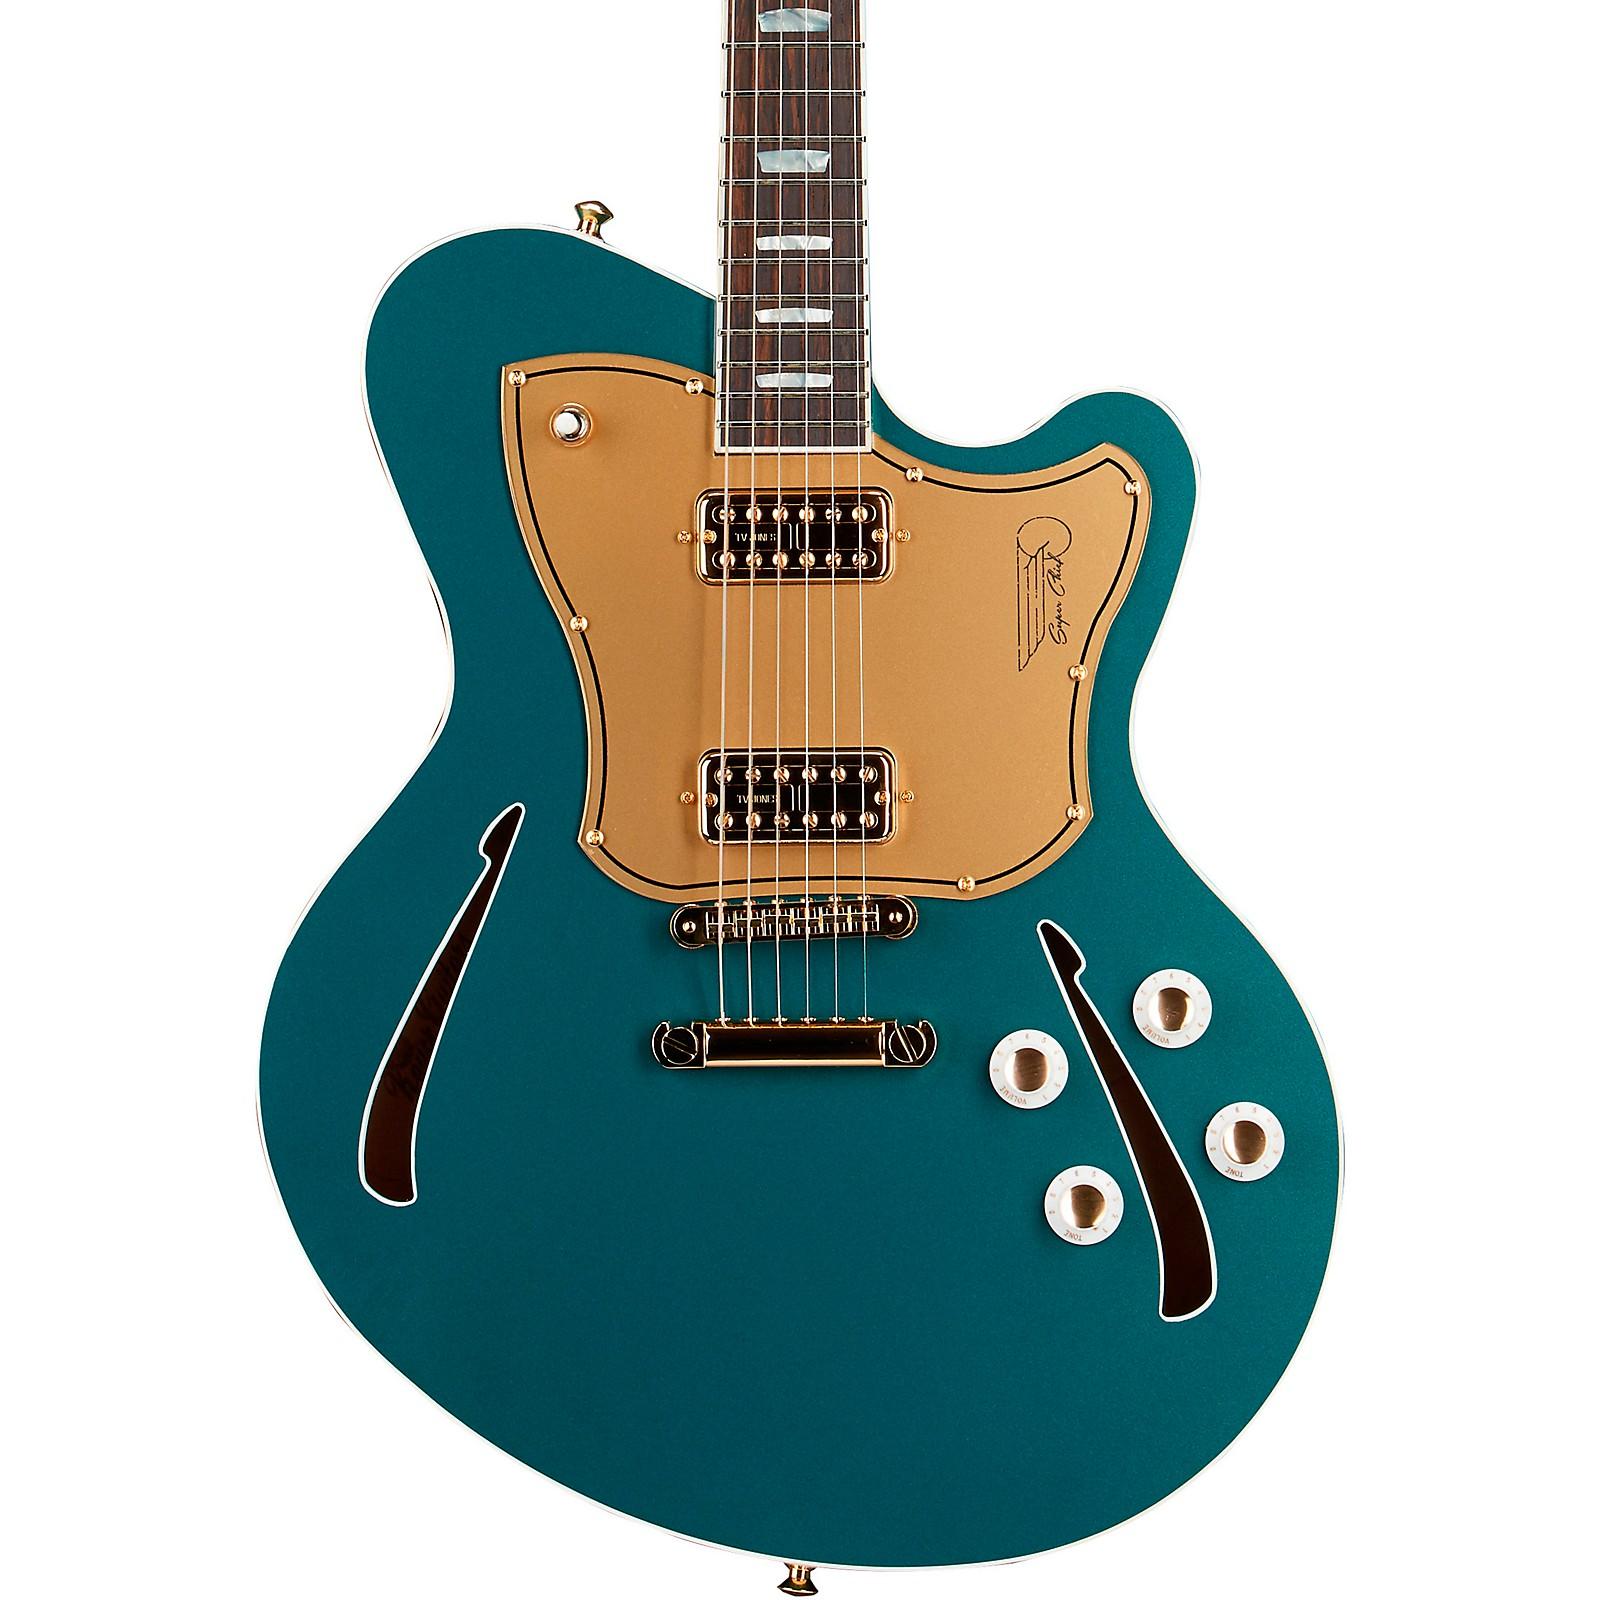 Kauer Guitars Super Chief Powertron Semi-Hollow Electric Guitar